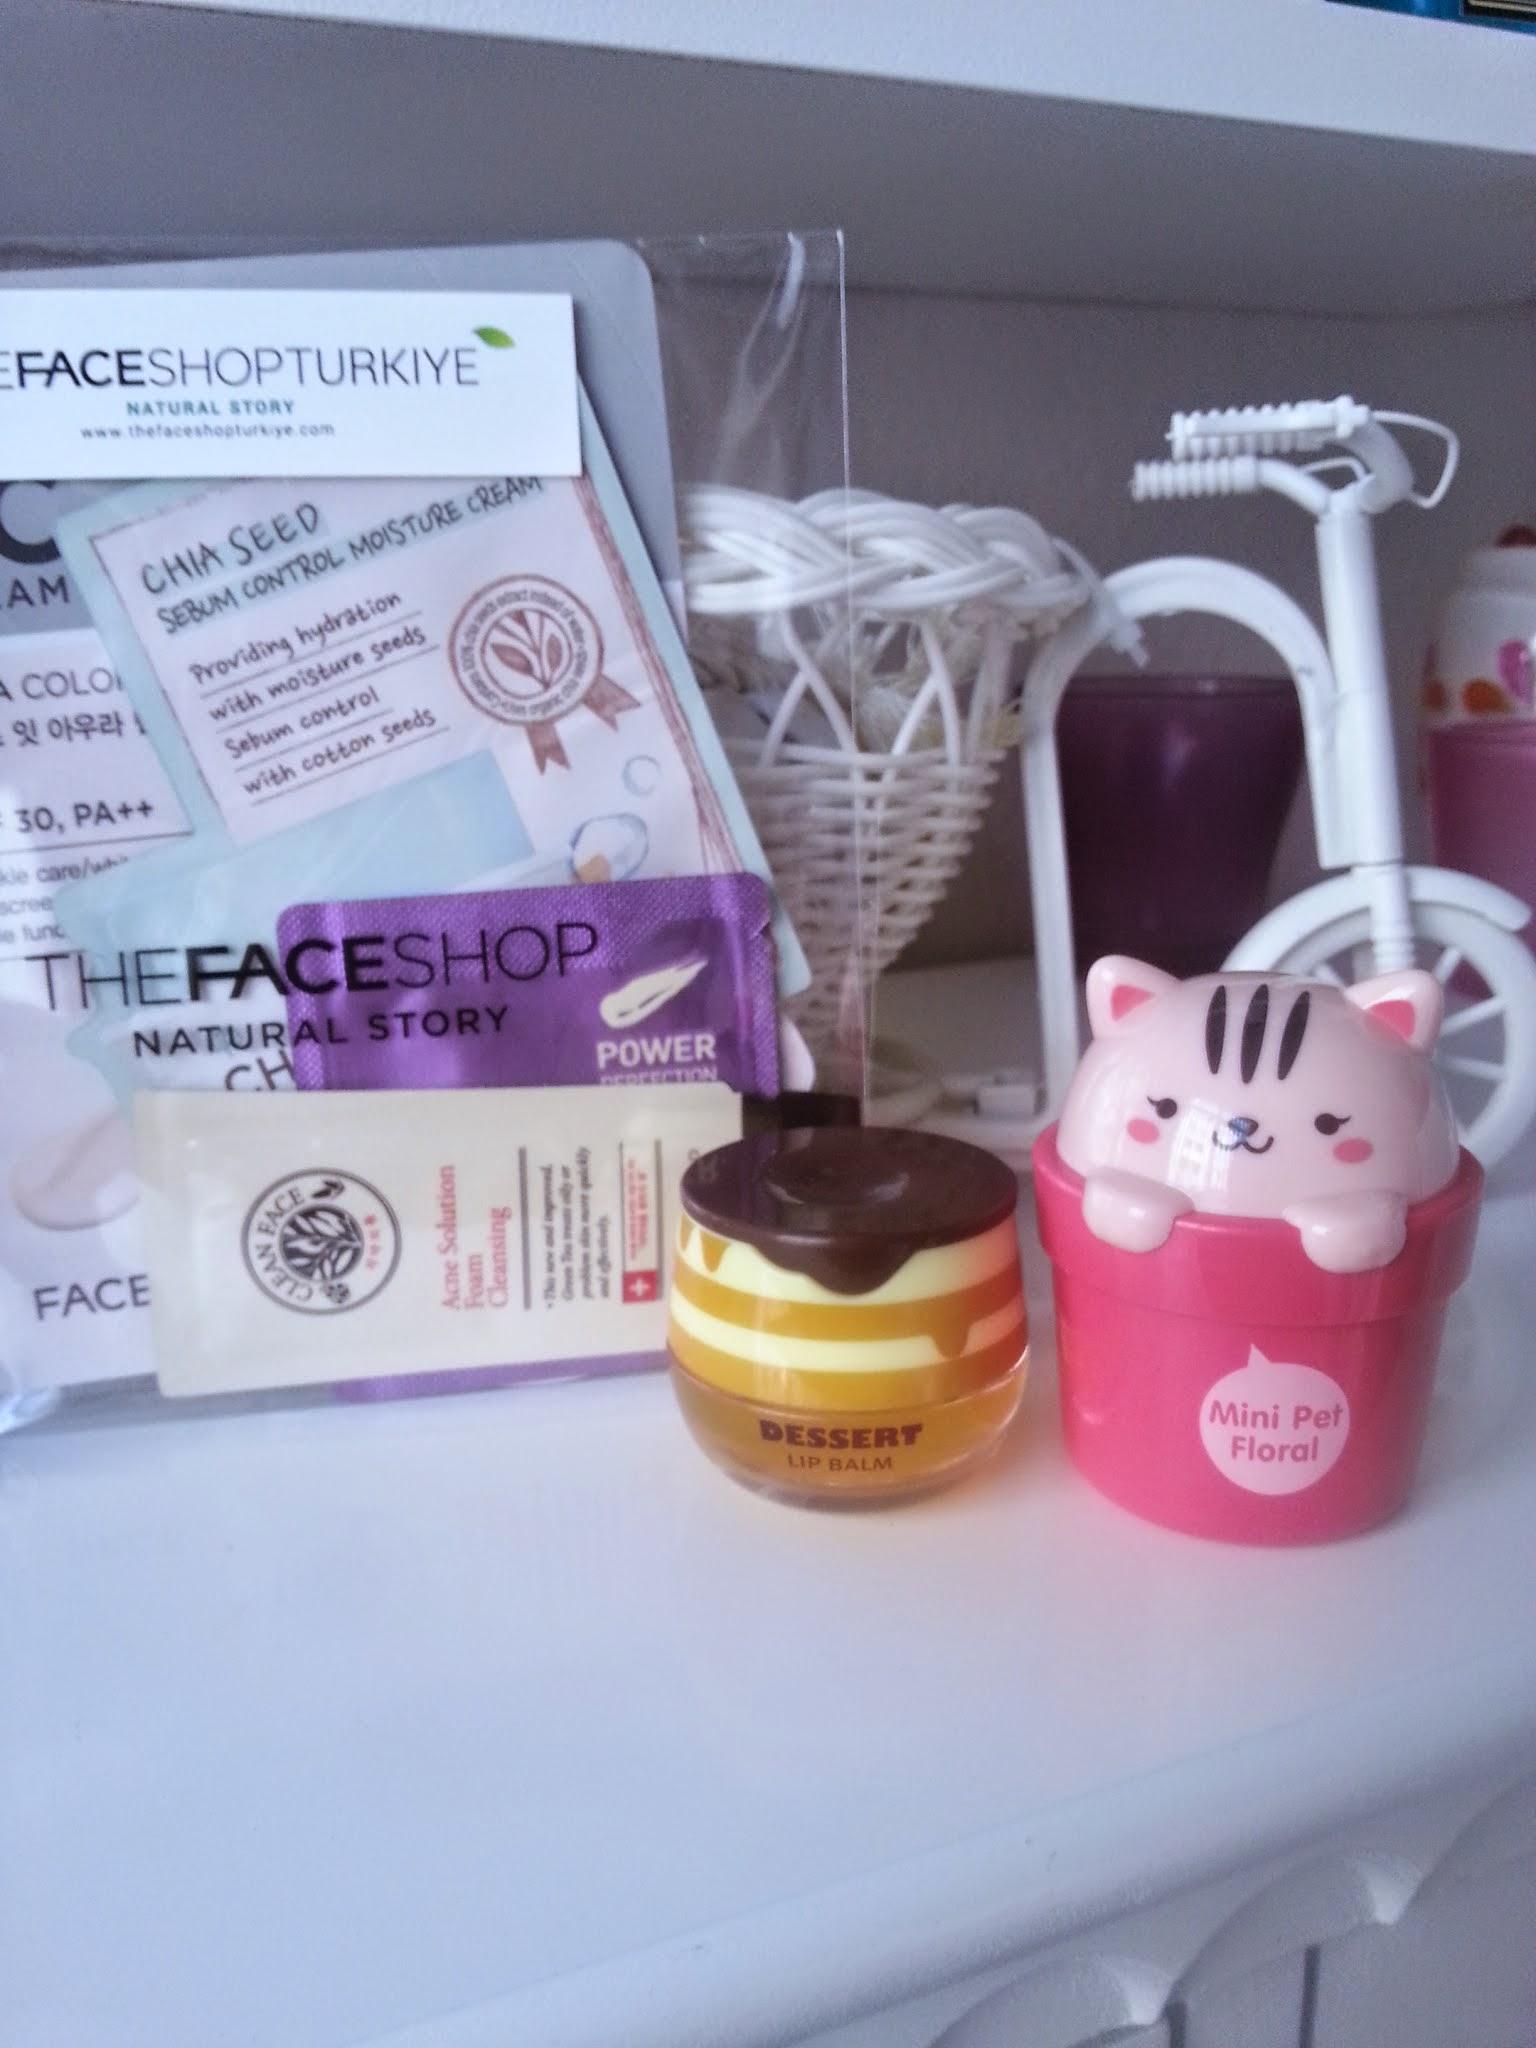 Alisveris 1 / The Face Shop